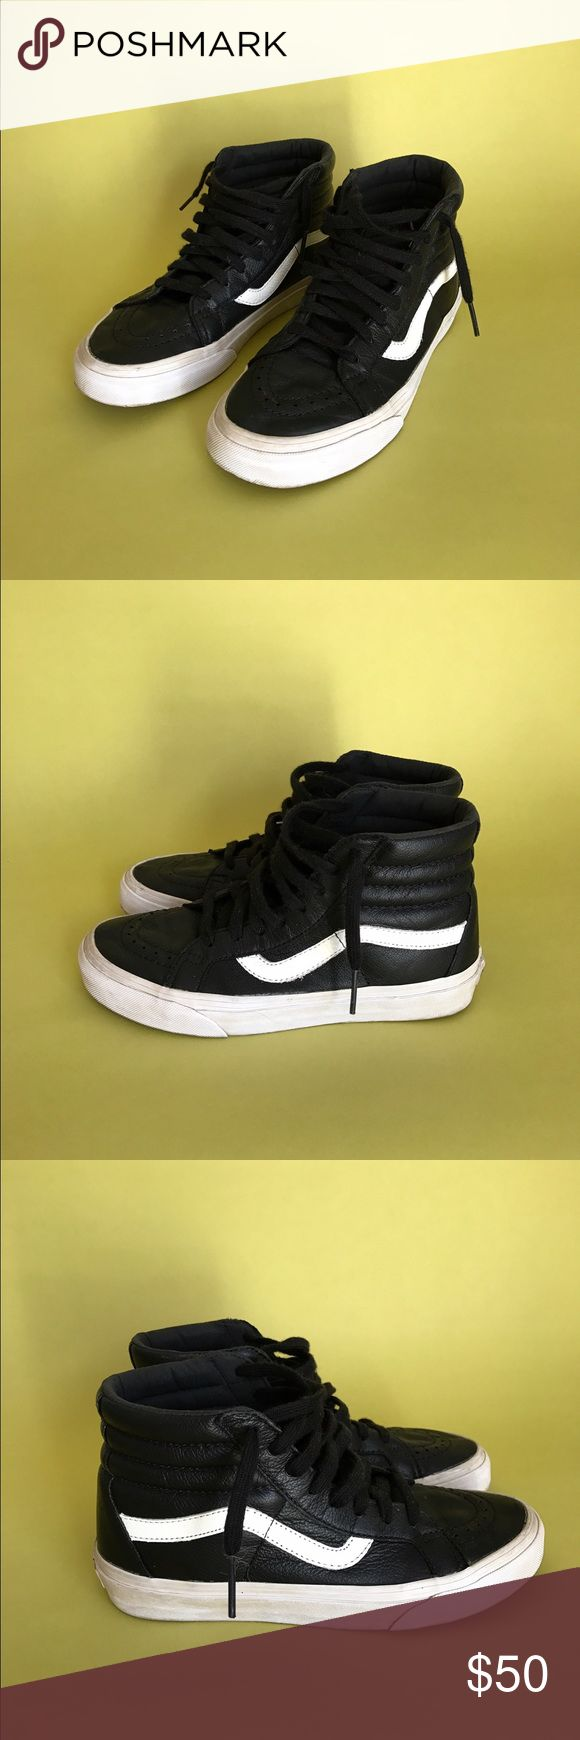 Vans women's leather sk8-hi shoes black Black leather hi top tennis shoes by Vans with waffle pattern sole. Size 7 women's. Vans Shoes Sneakers